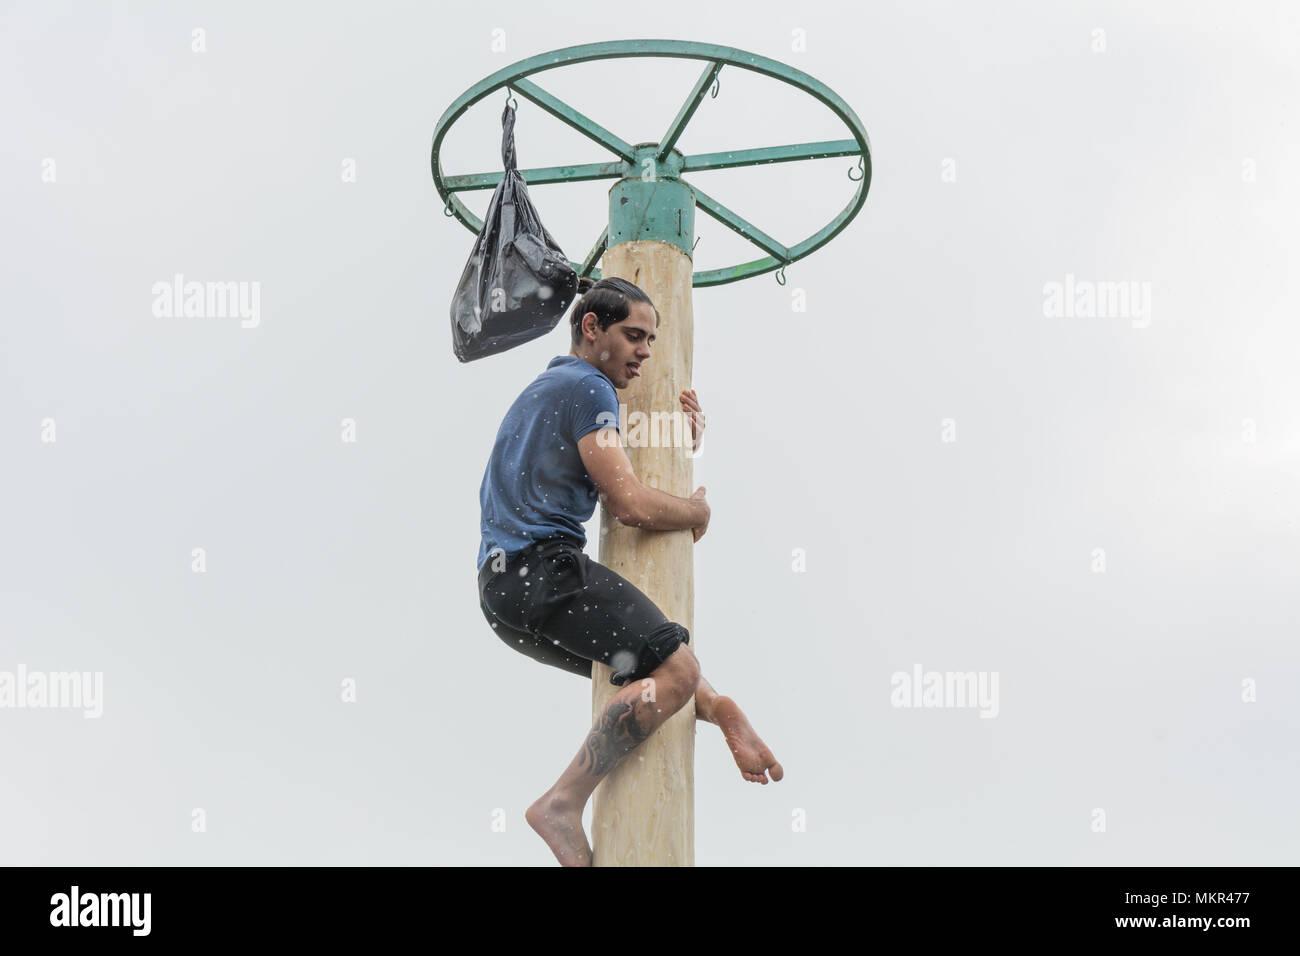 TIRASPOL, MOLDOVA - FEBRUARY 18, 2018: Young man climbing on a wooden pole for the prize. Slavonic folk pagan holiday Maslenitsa (Shrovetide) - a symb - Stock Image